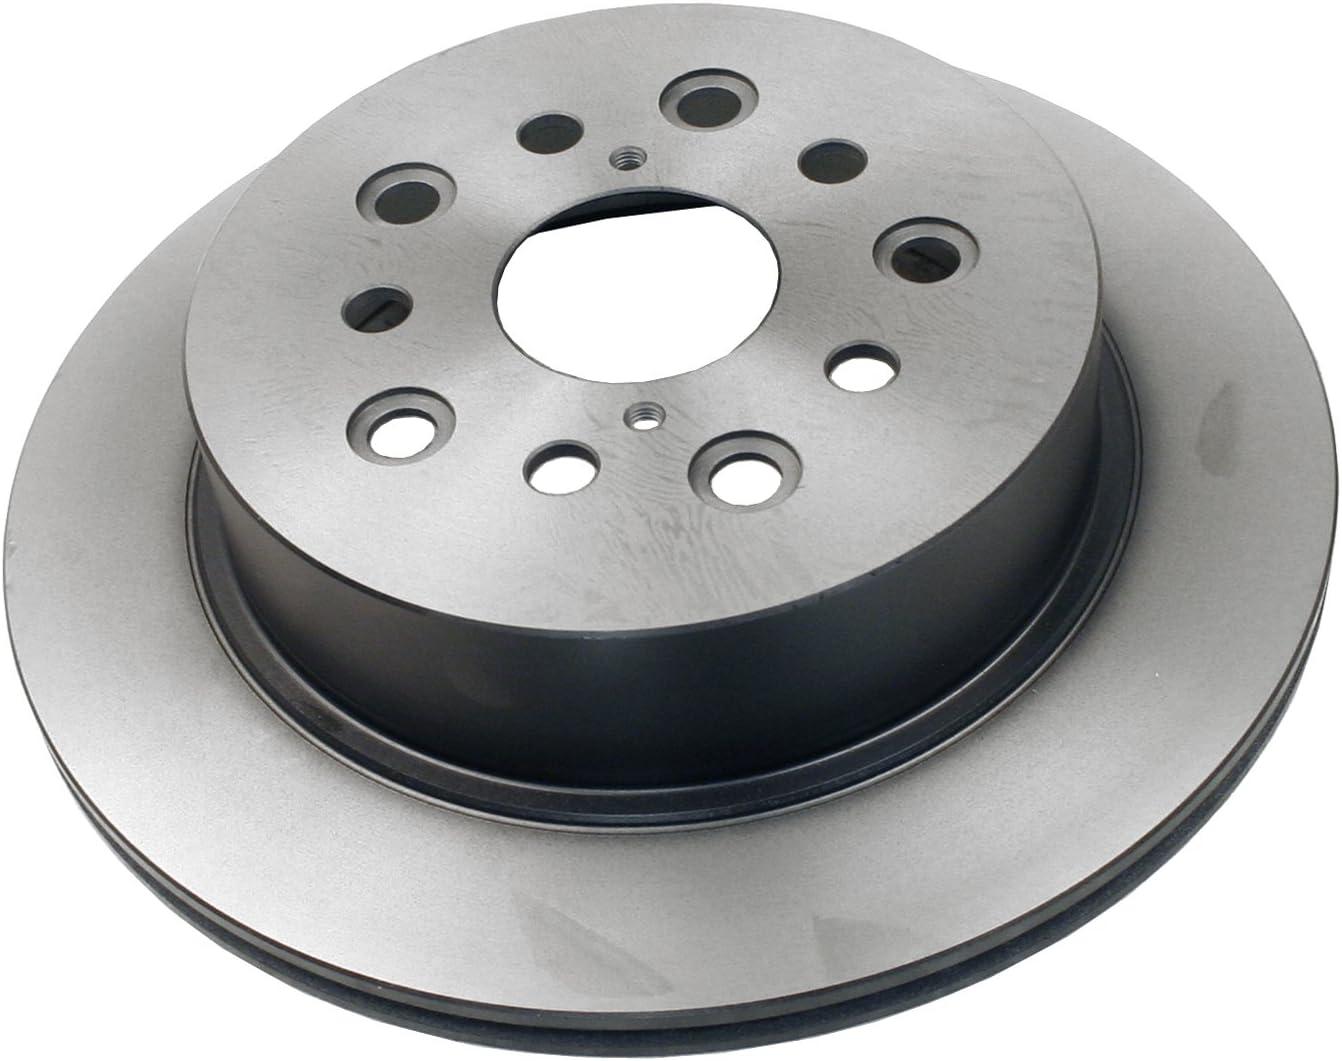 Kia 58736-3E000 Disc Brake Hydraulic Hose